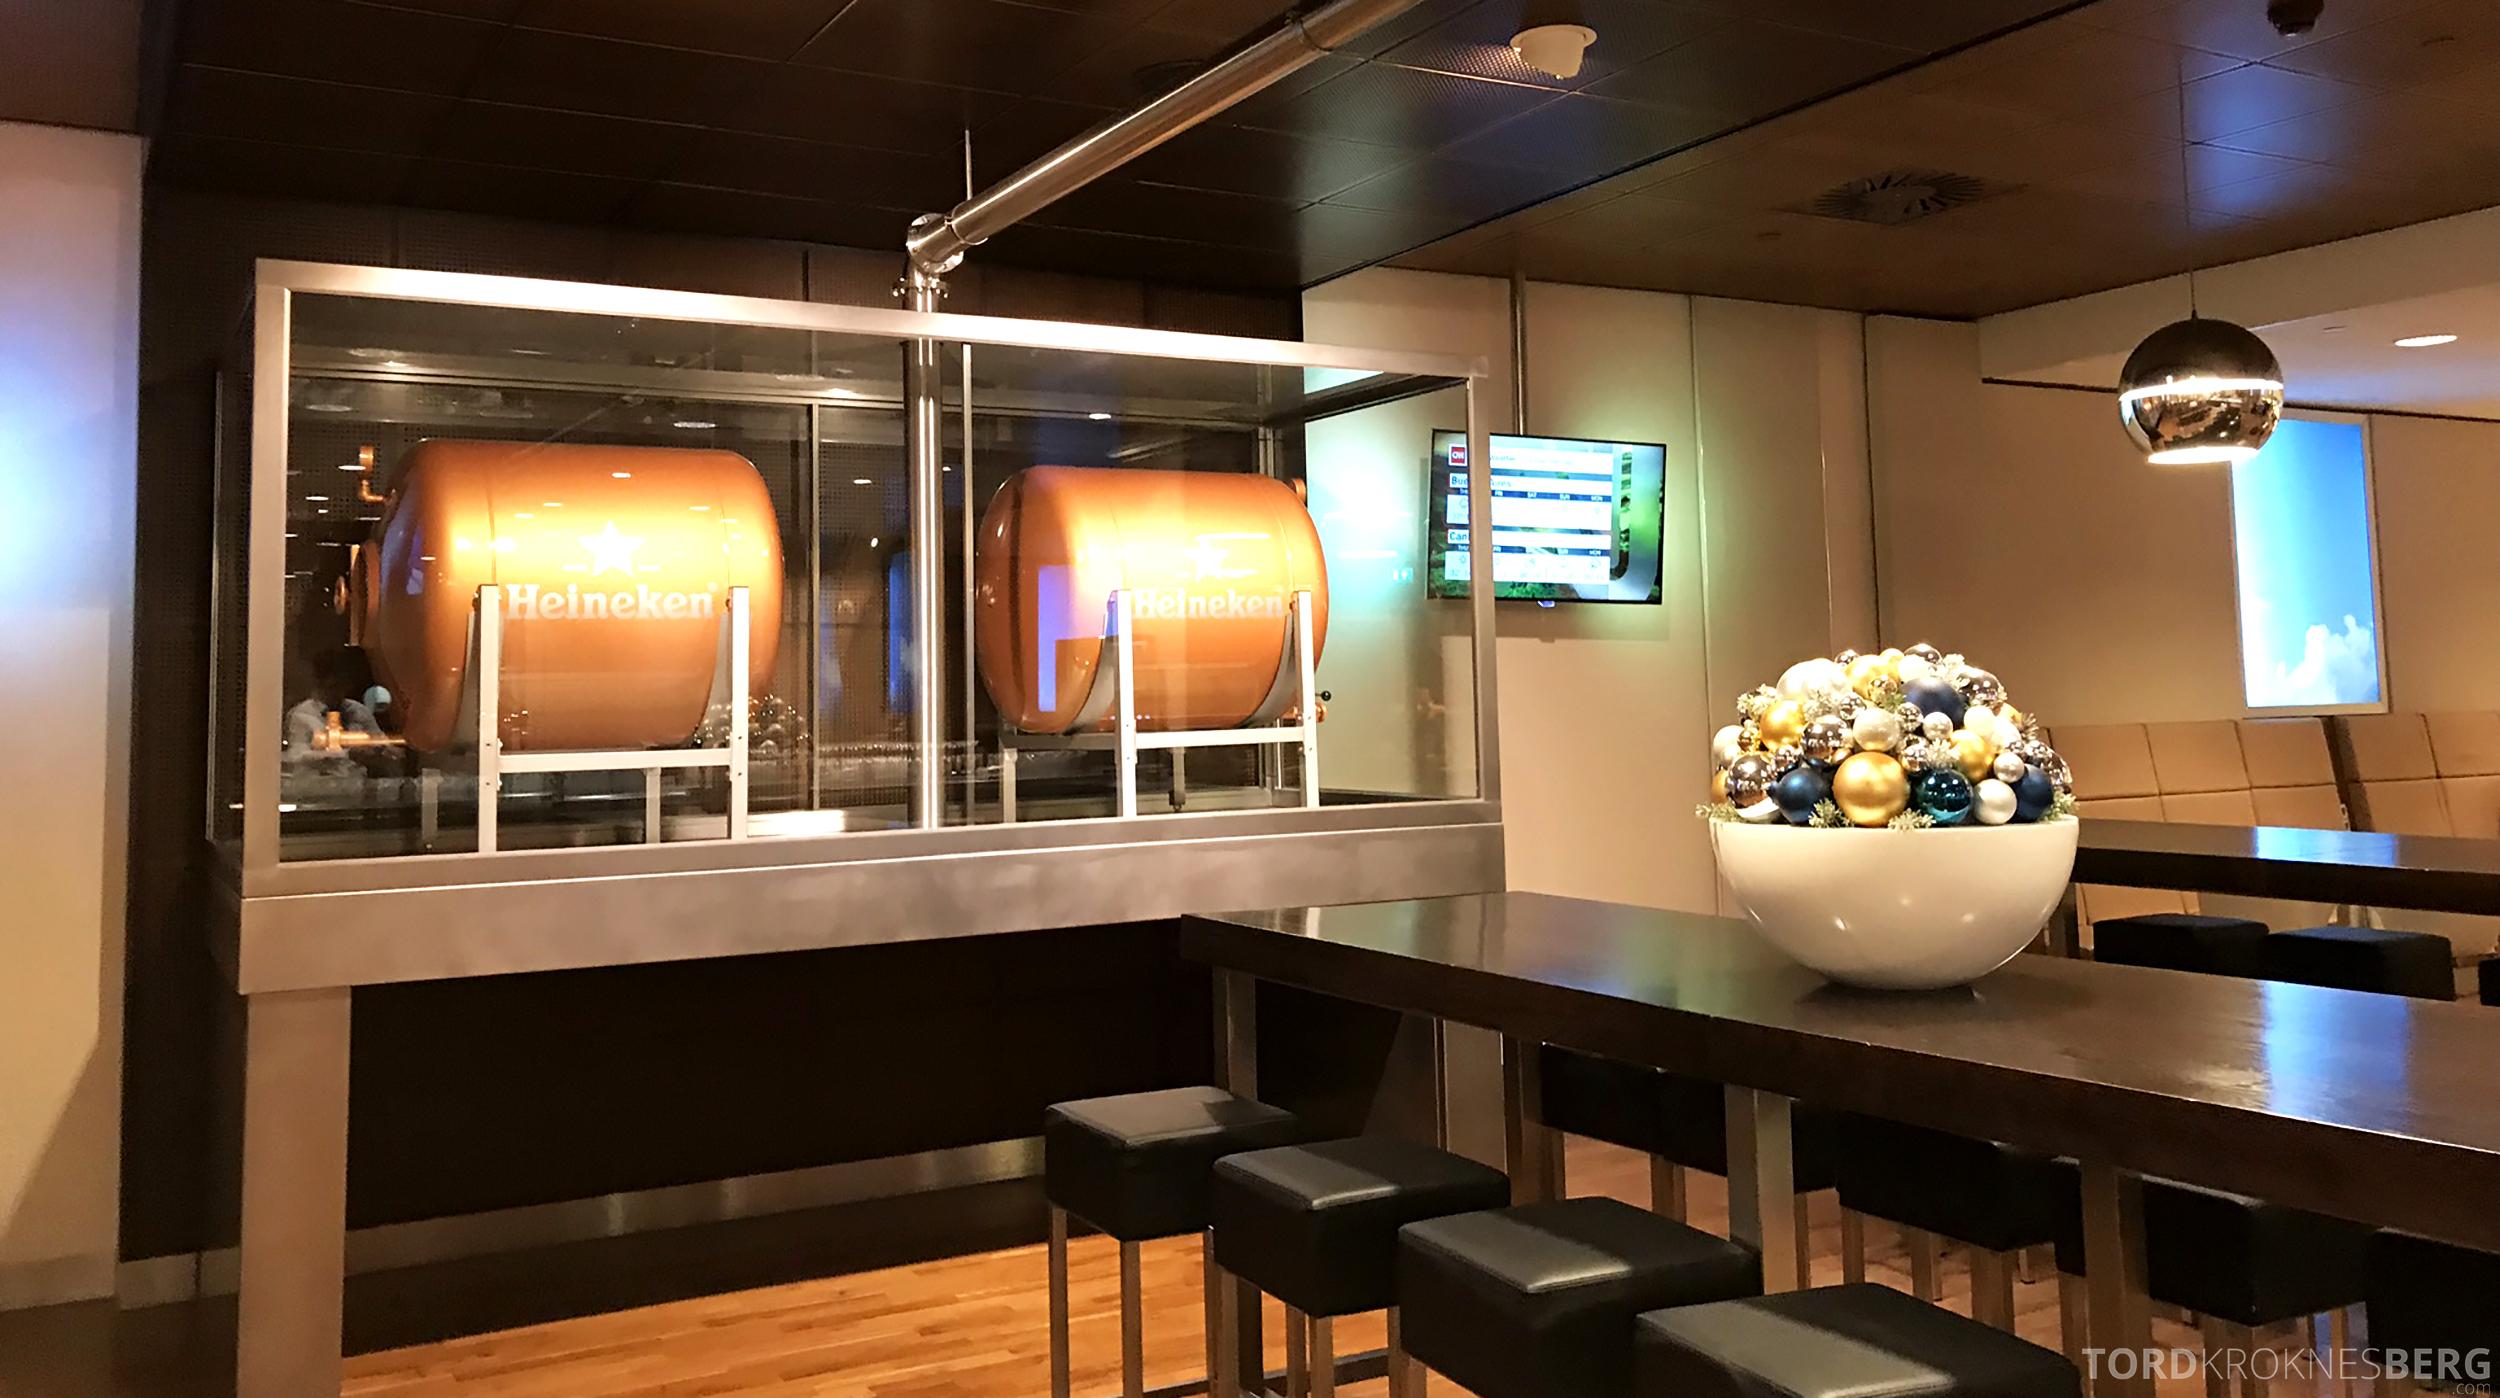 KLM Crown Lounge Schiphol Amsterdam øl